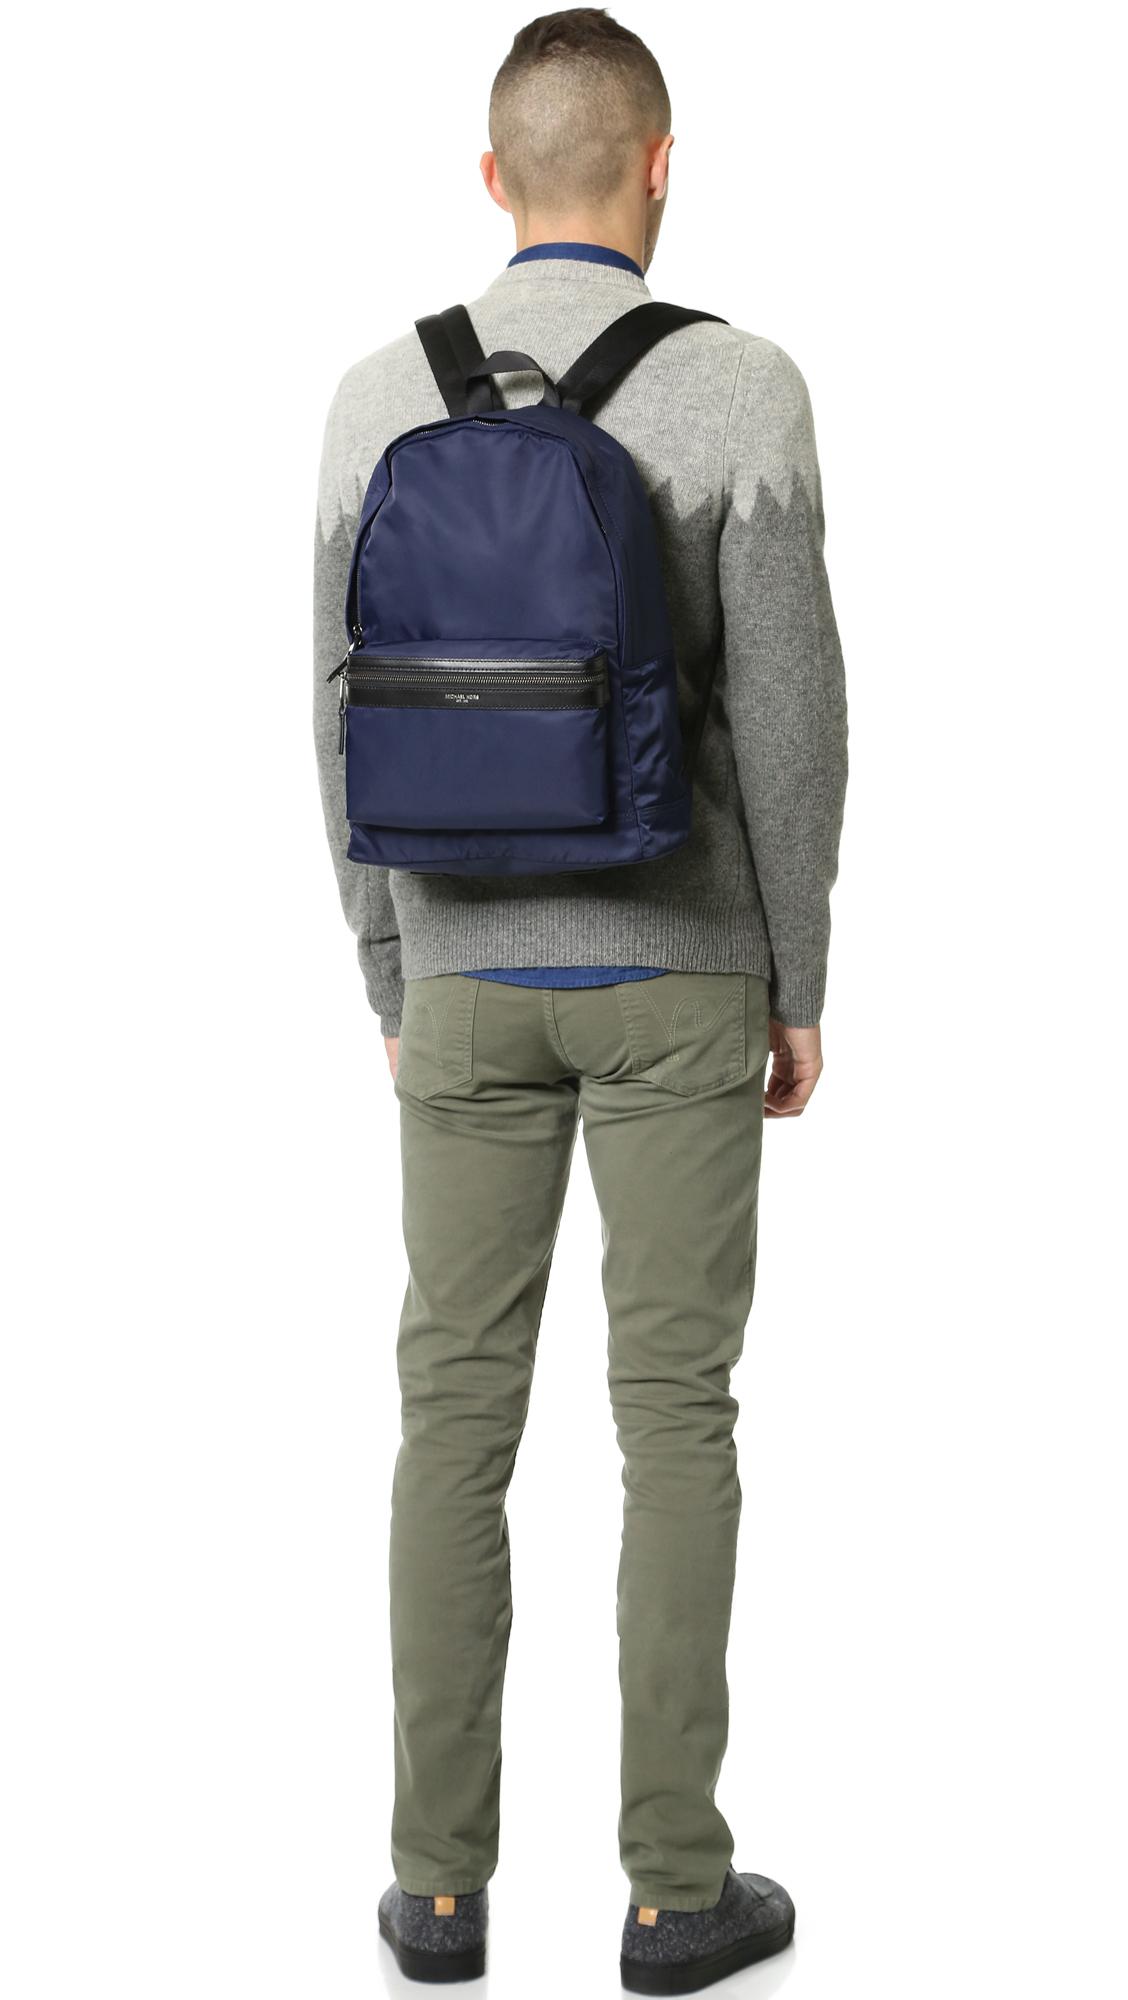 f2028f18afdc Michael Kors Kent Nylon Backpack in Blue for Men - Lyst